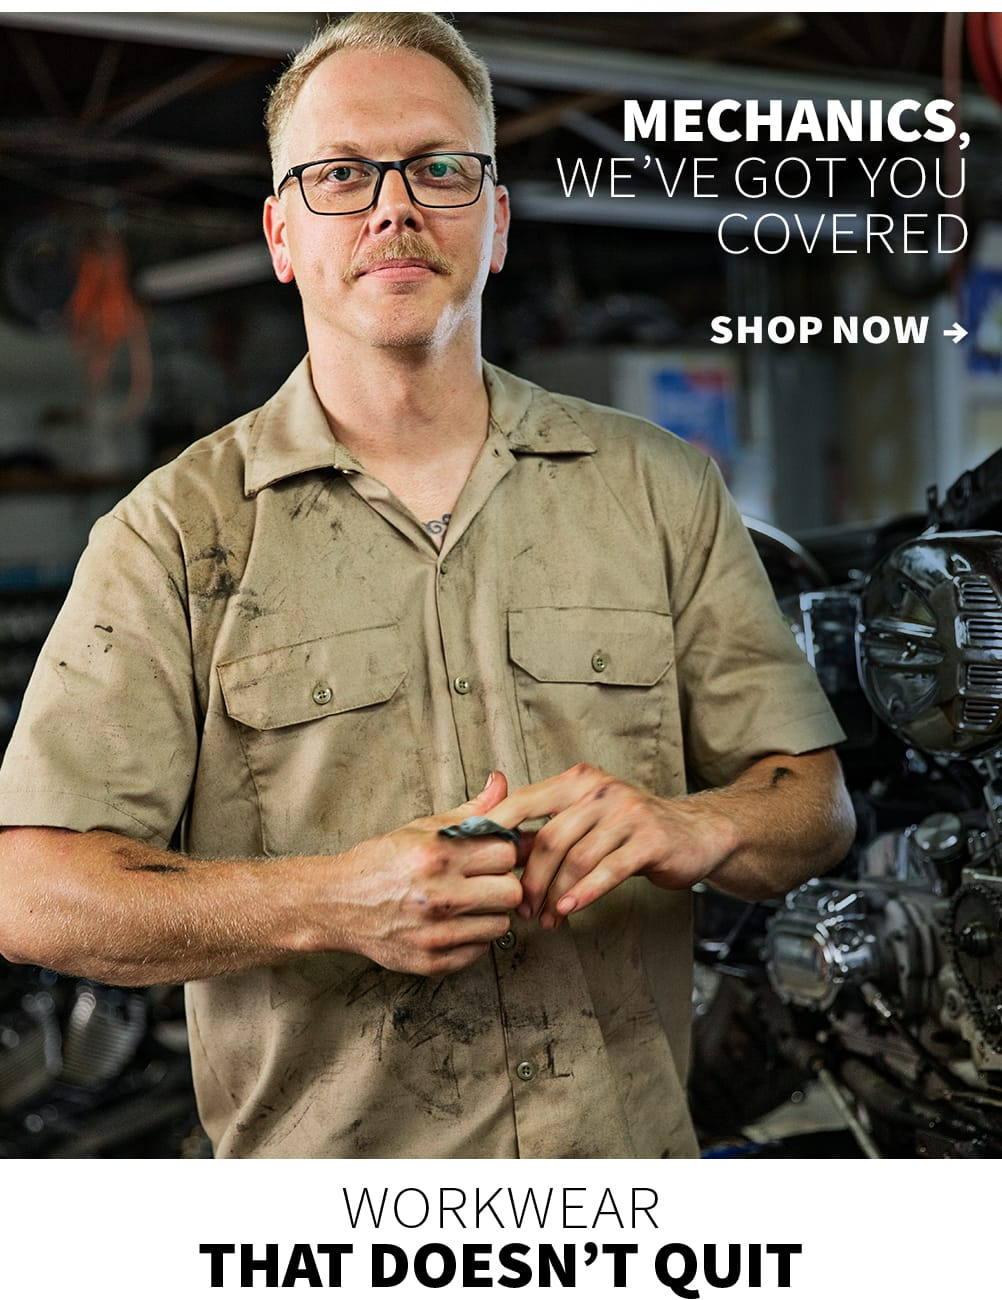 Mechanics, we've got you covered. Shop now